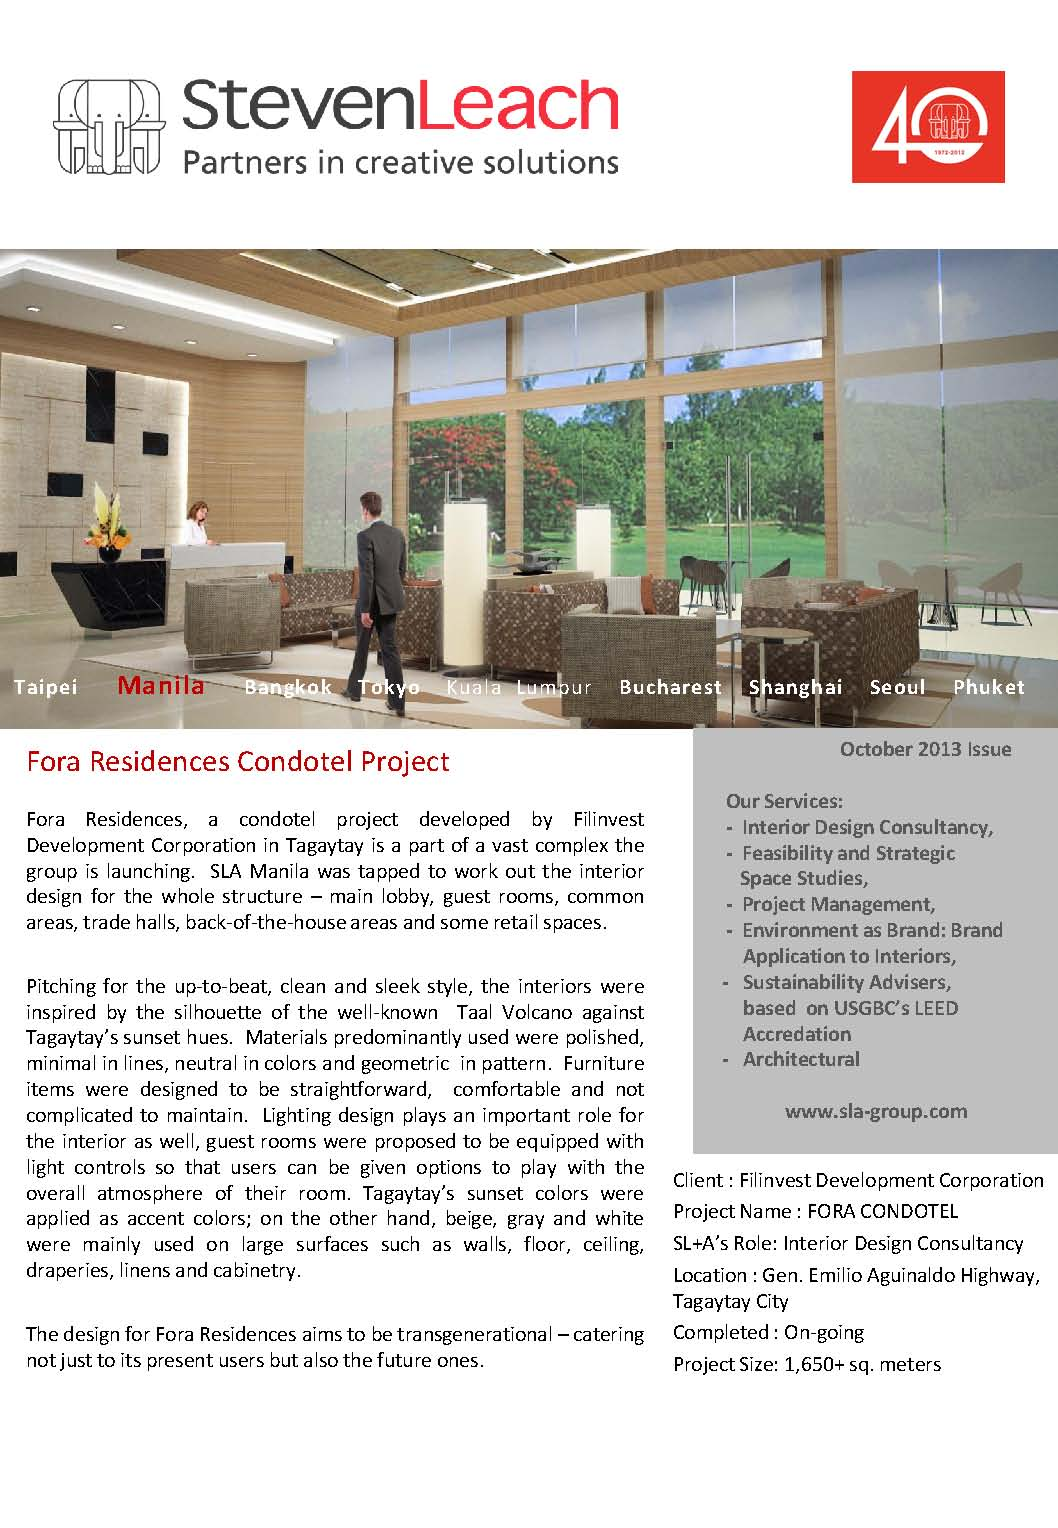 Fora Residences Condotel Project